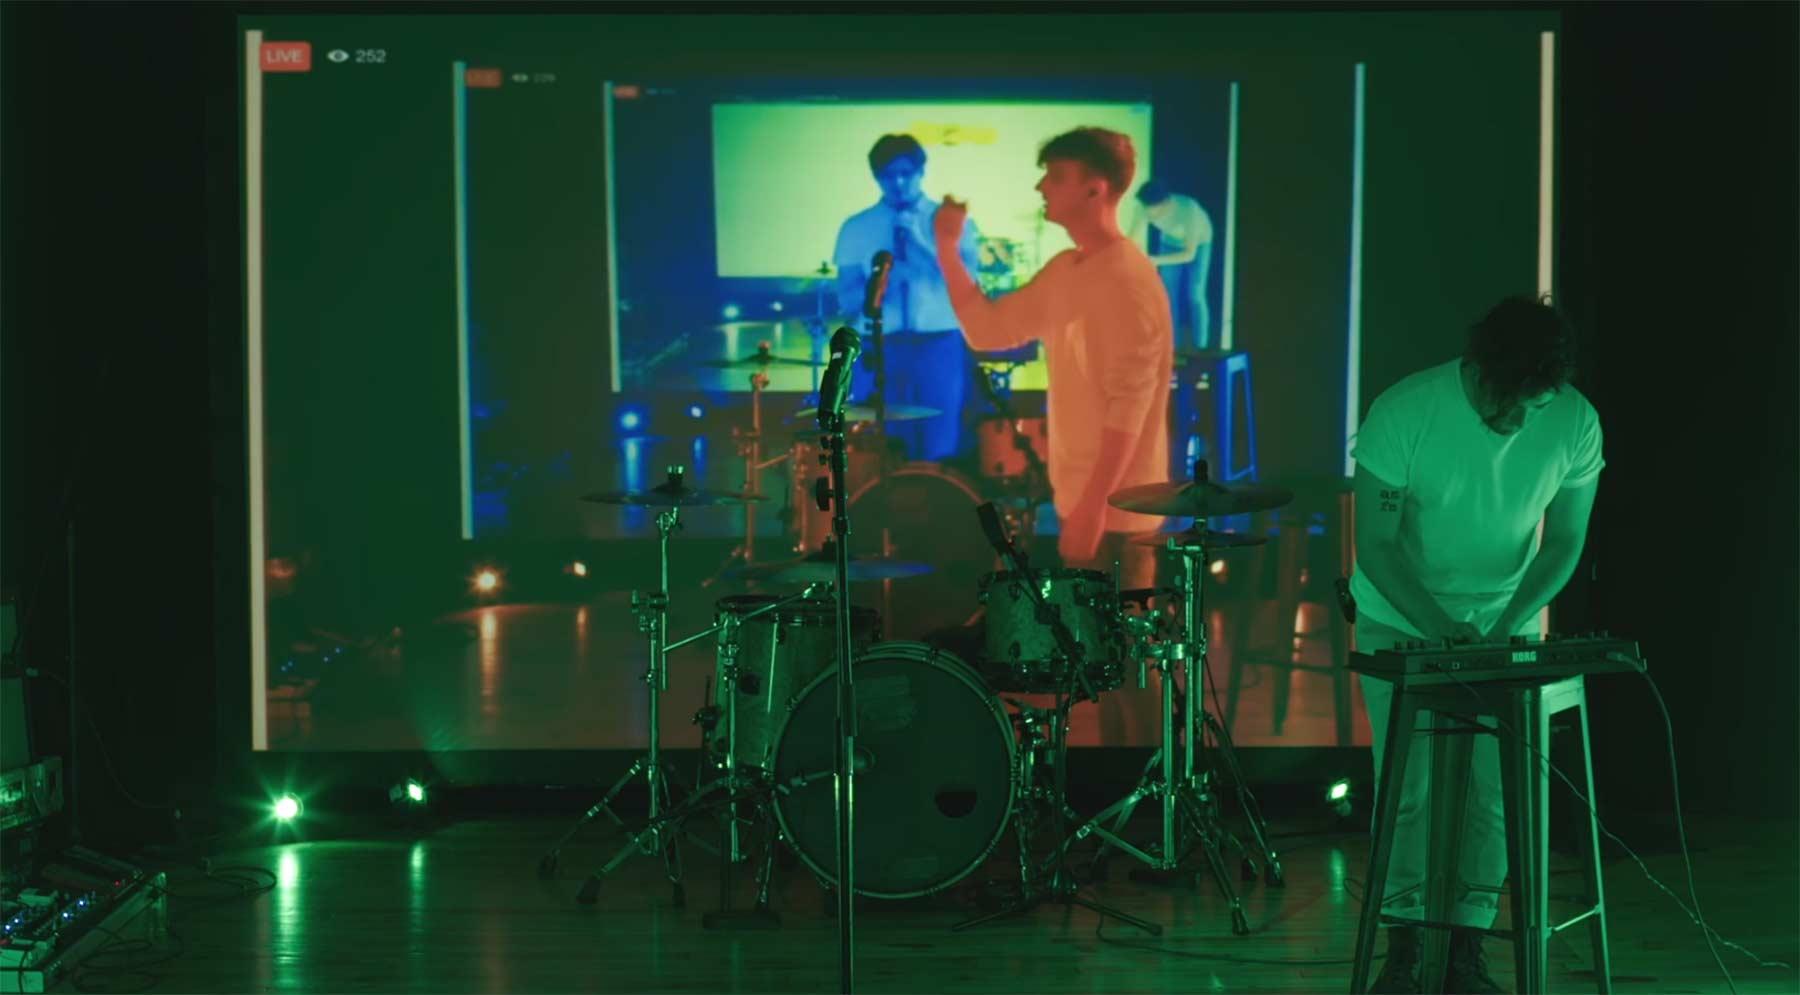 Musikvideo als Loop gegen die Facebook Live-Verzögerung